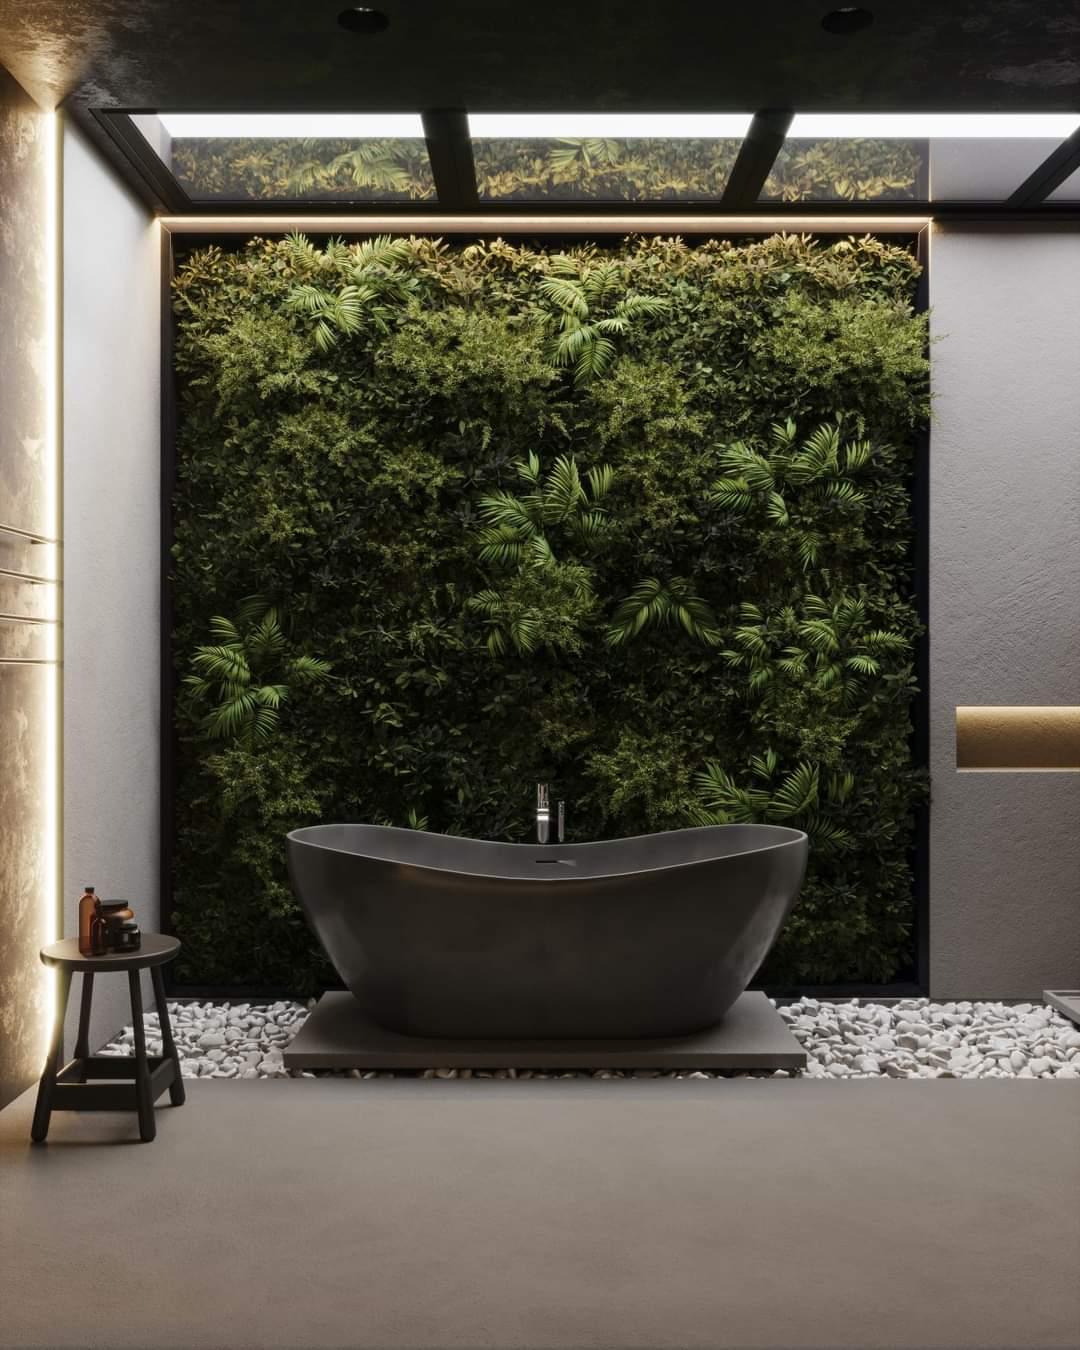 Modern Bath Tub Set Up - Source: Kireevaaanna